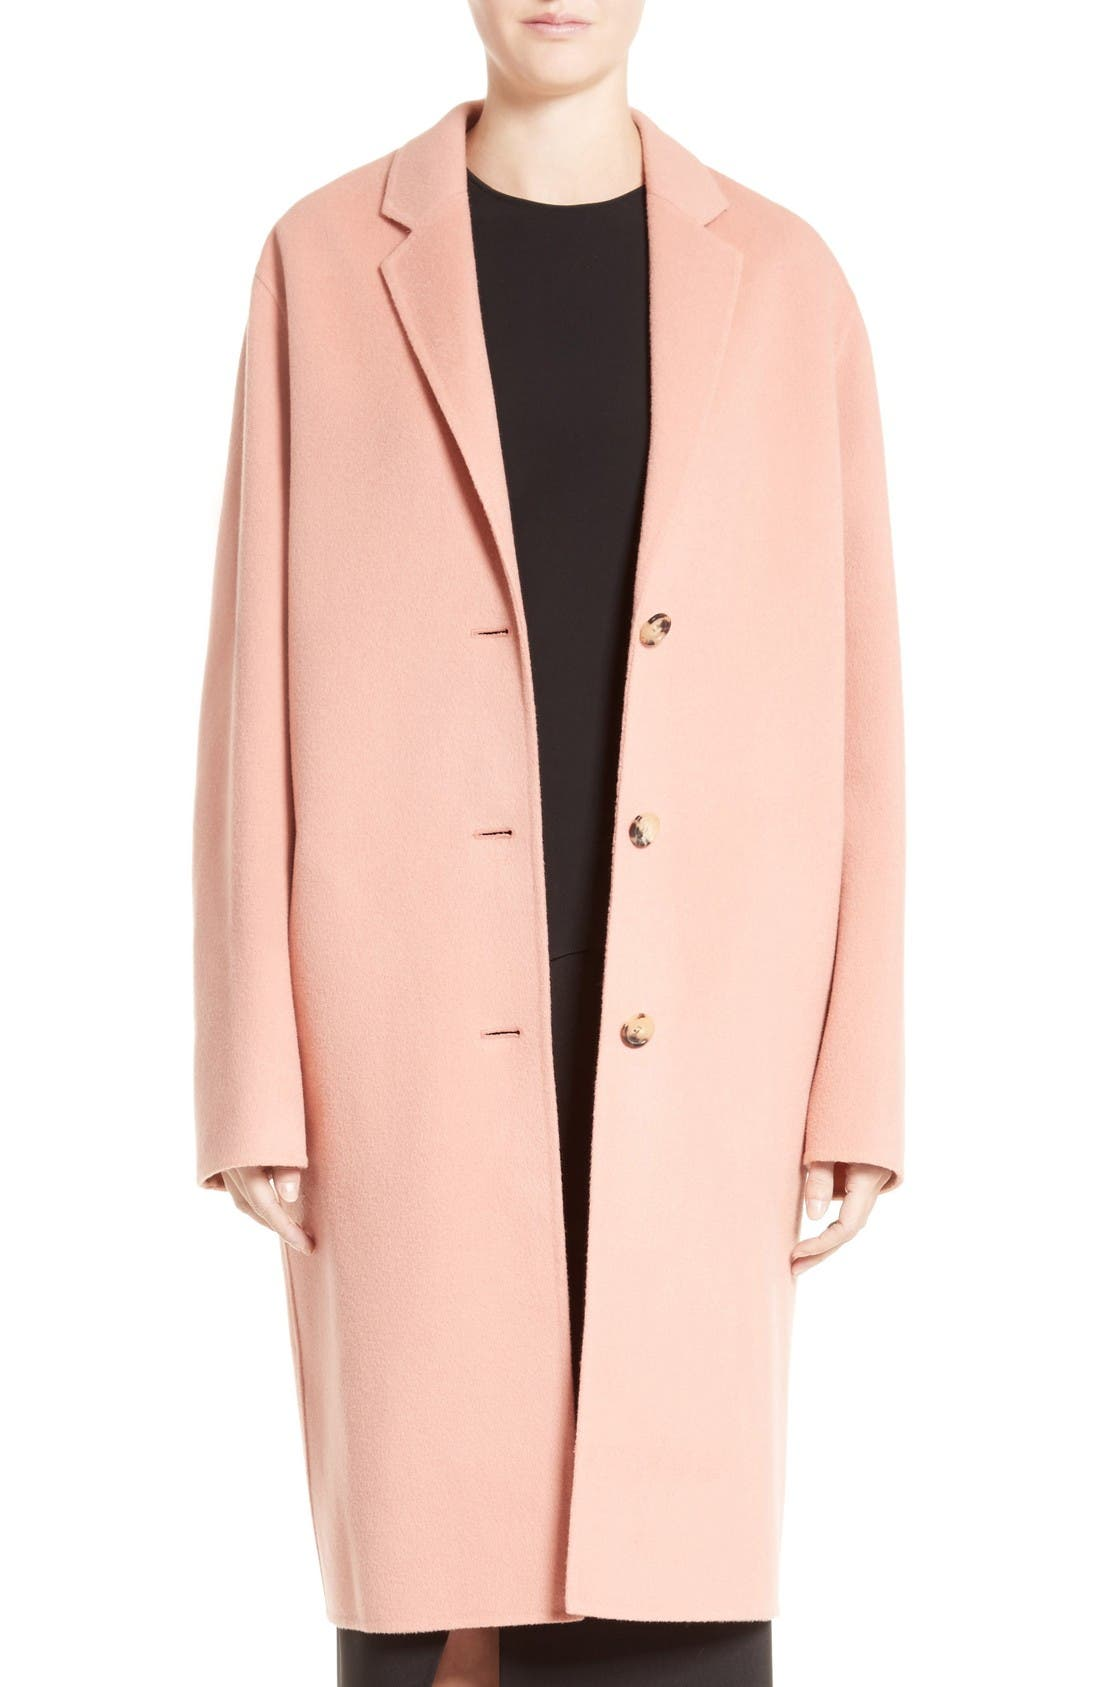 ACNE STUDIOS Avalon Wool & Cashmere Coat